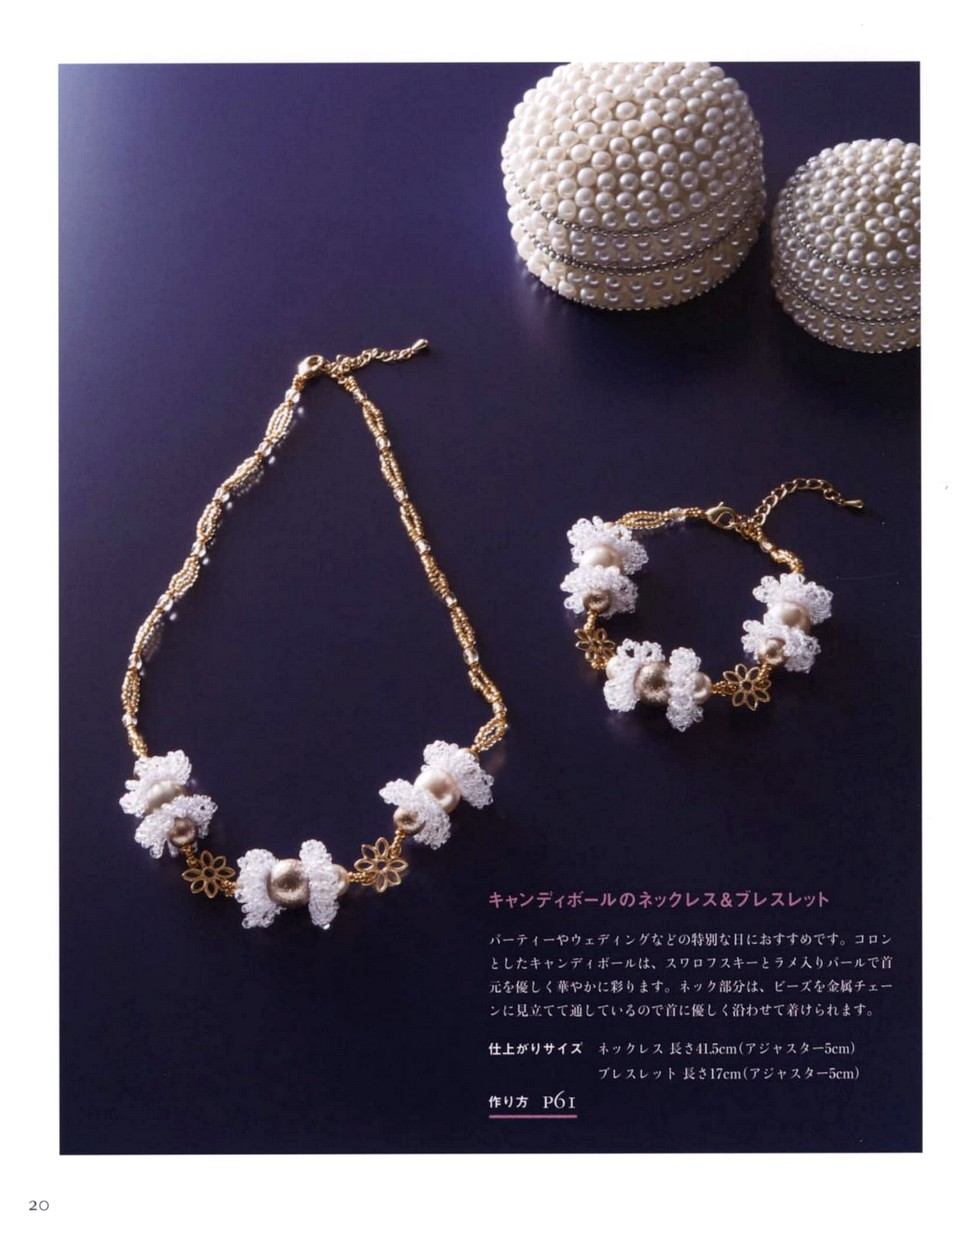 717 Beads Crochet 17-21